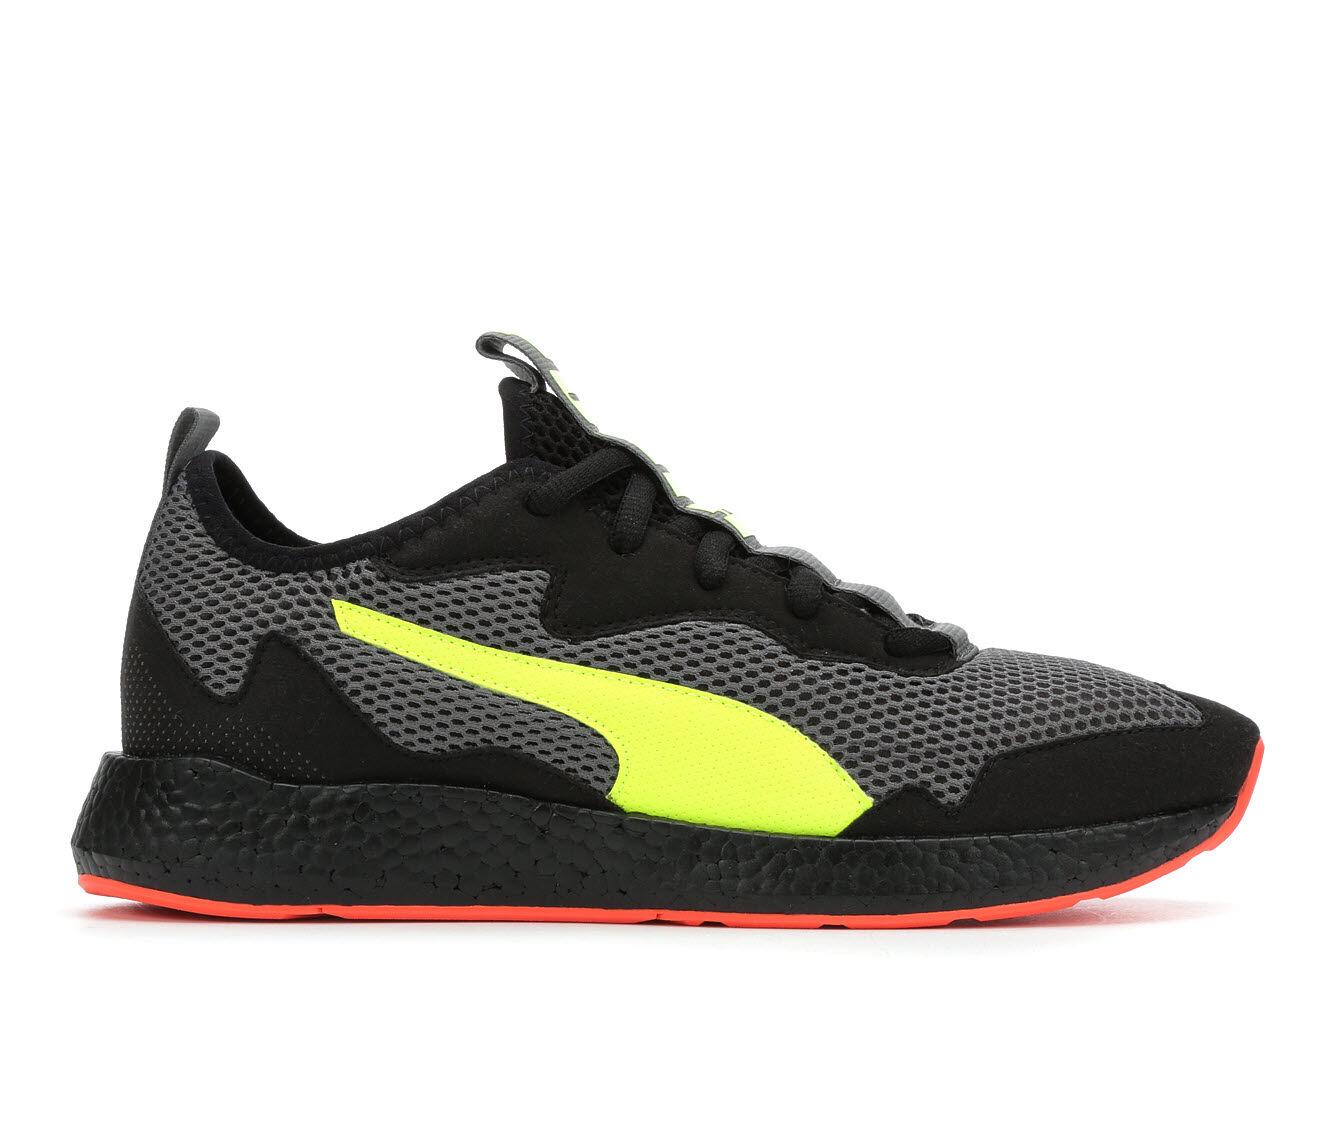 uk shoes_kd1045